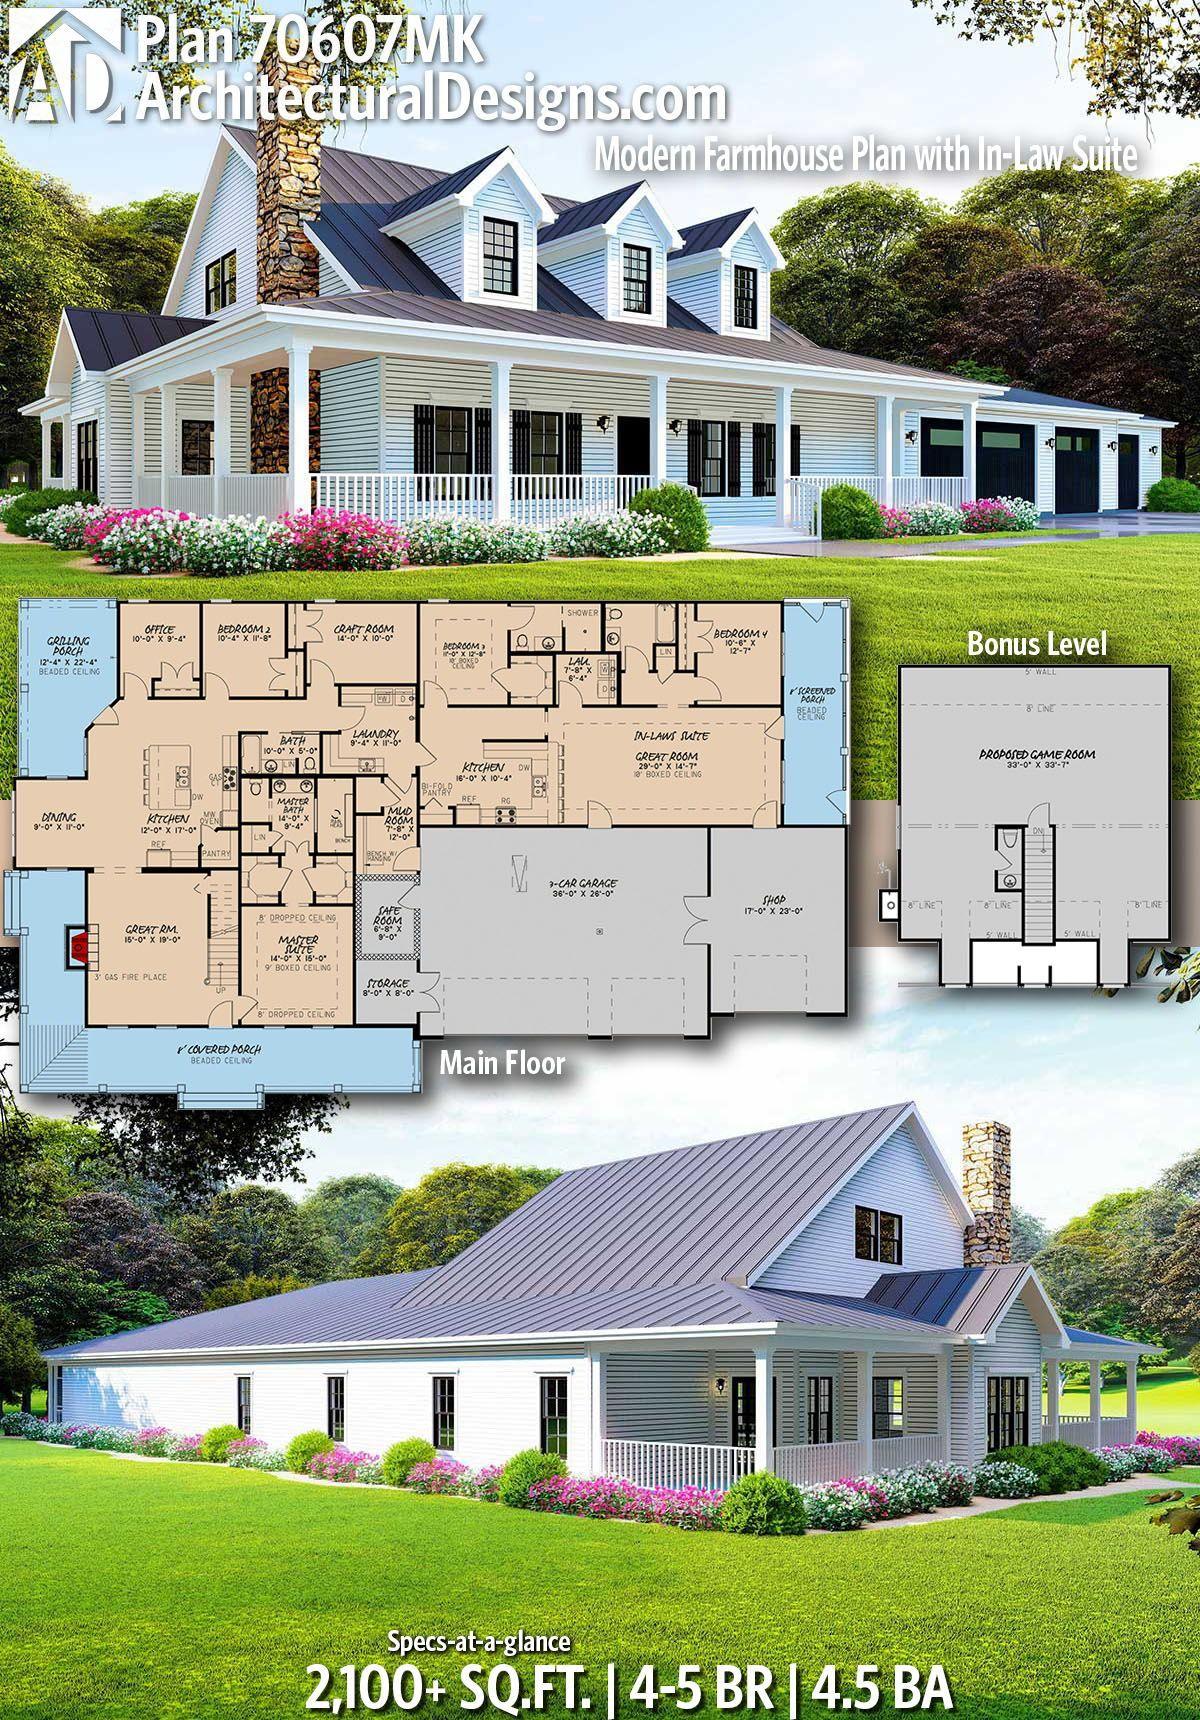 Plan 70607mk Modern Farmhouse Plan With In Law Suite Modern Farmhouse Plans Multigenerational House Plans House Plans Farmhouse